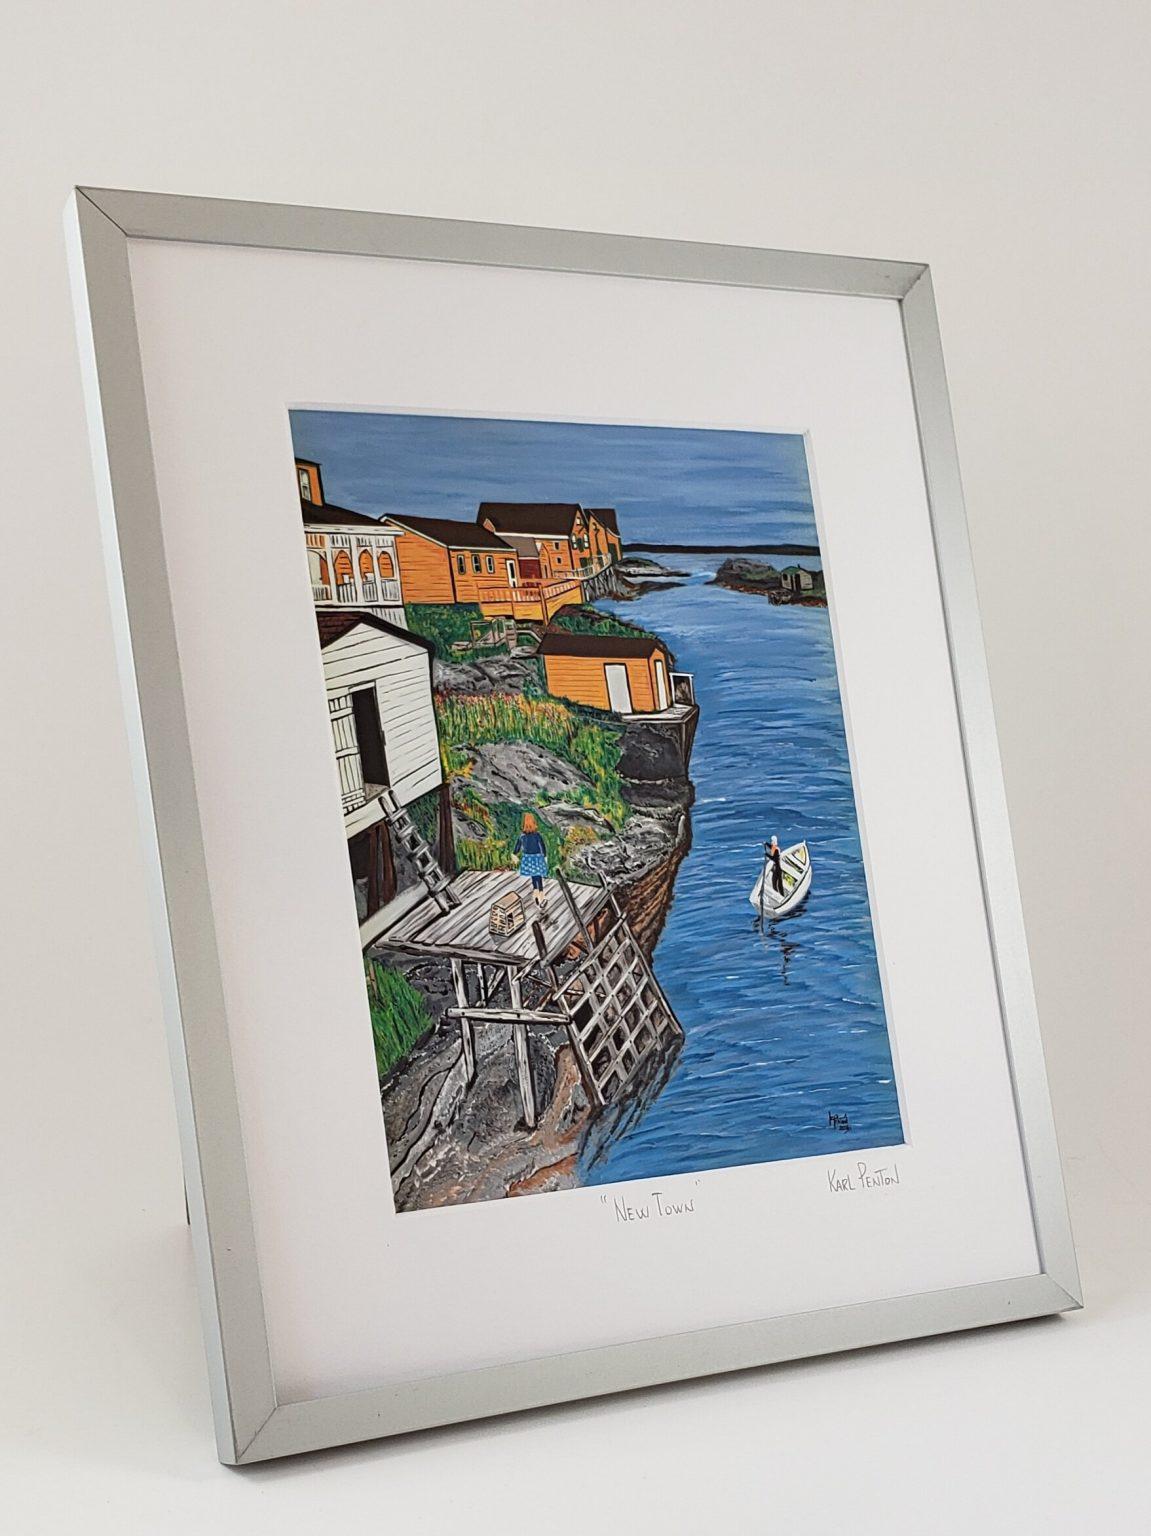 New Town framed print by Karl Penton